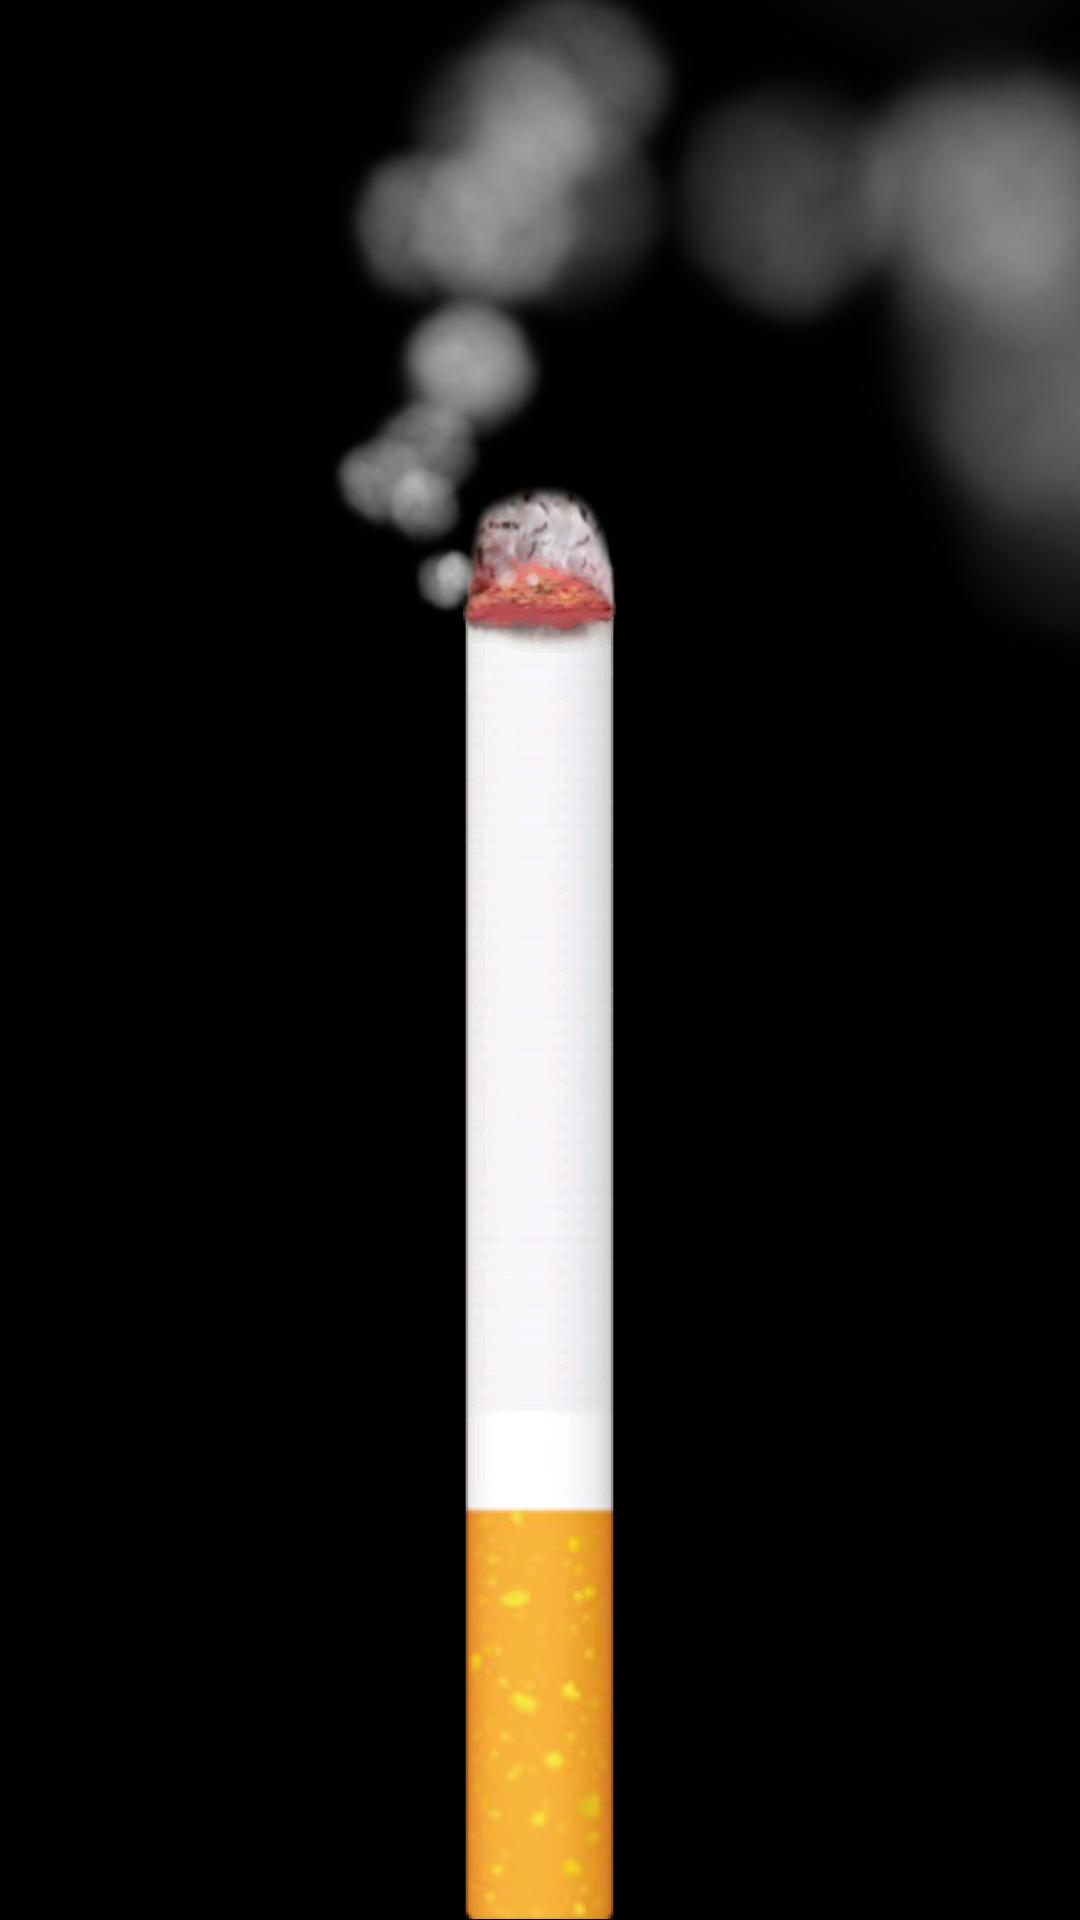 7700 Gambar Keren Rokok Gratis